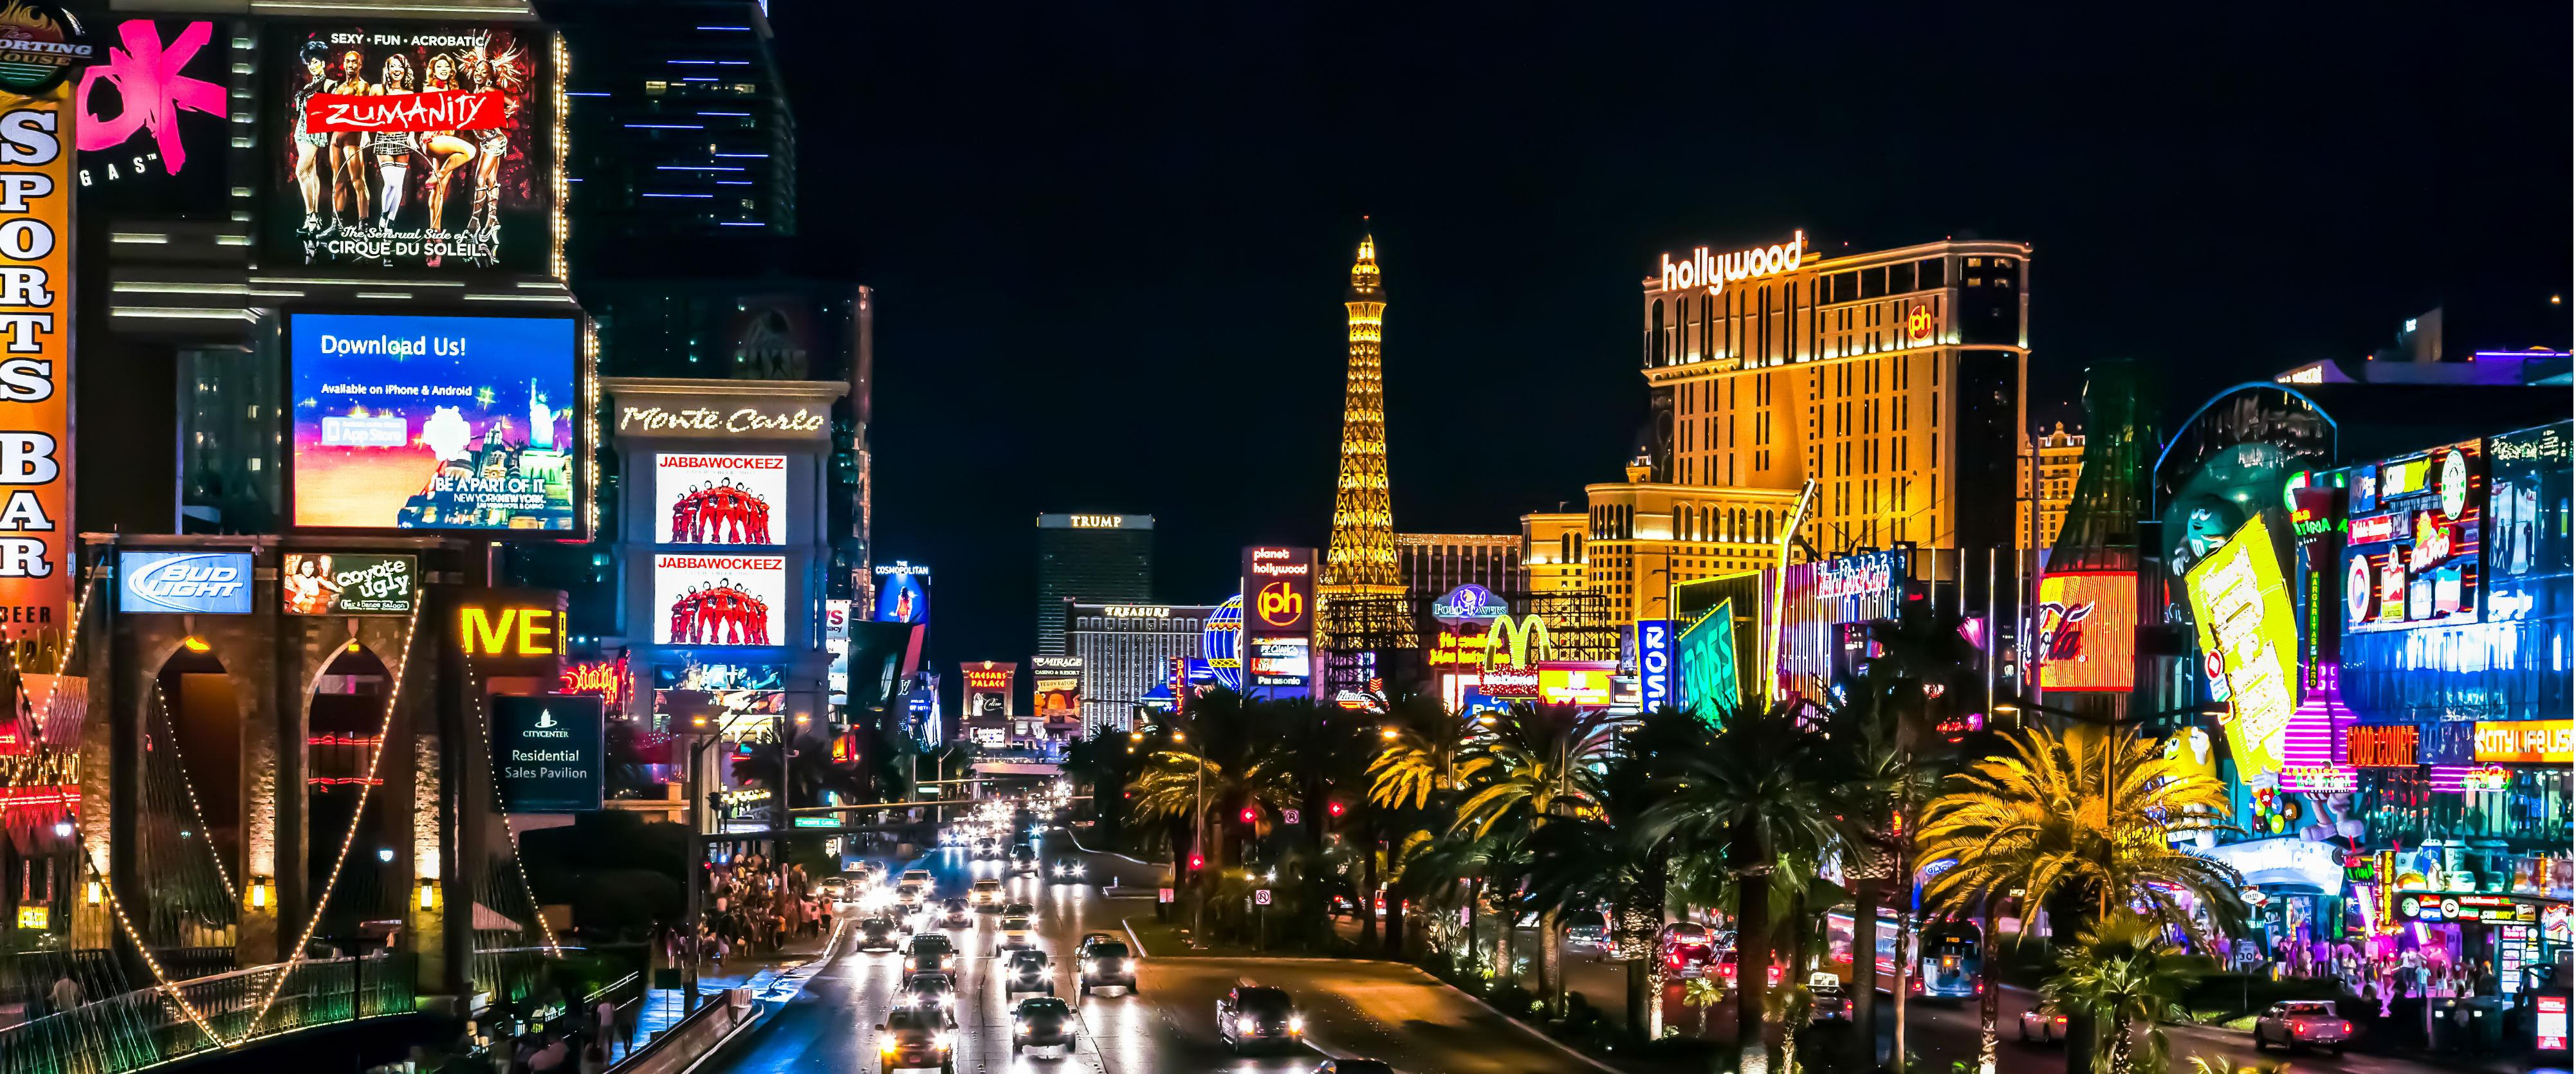 Top 10 Celeb Hotspots in Las Vegas - Casino org Blog